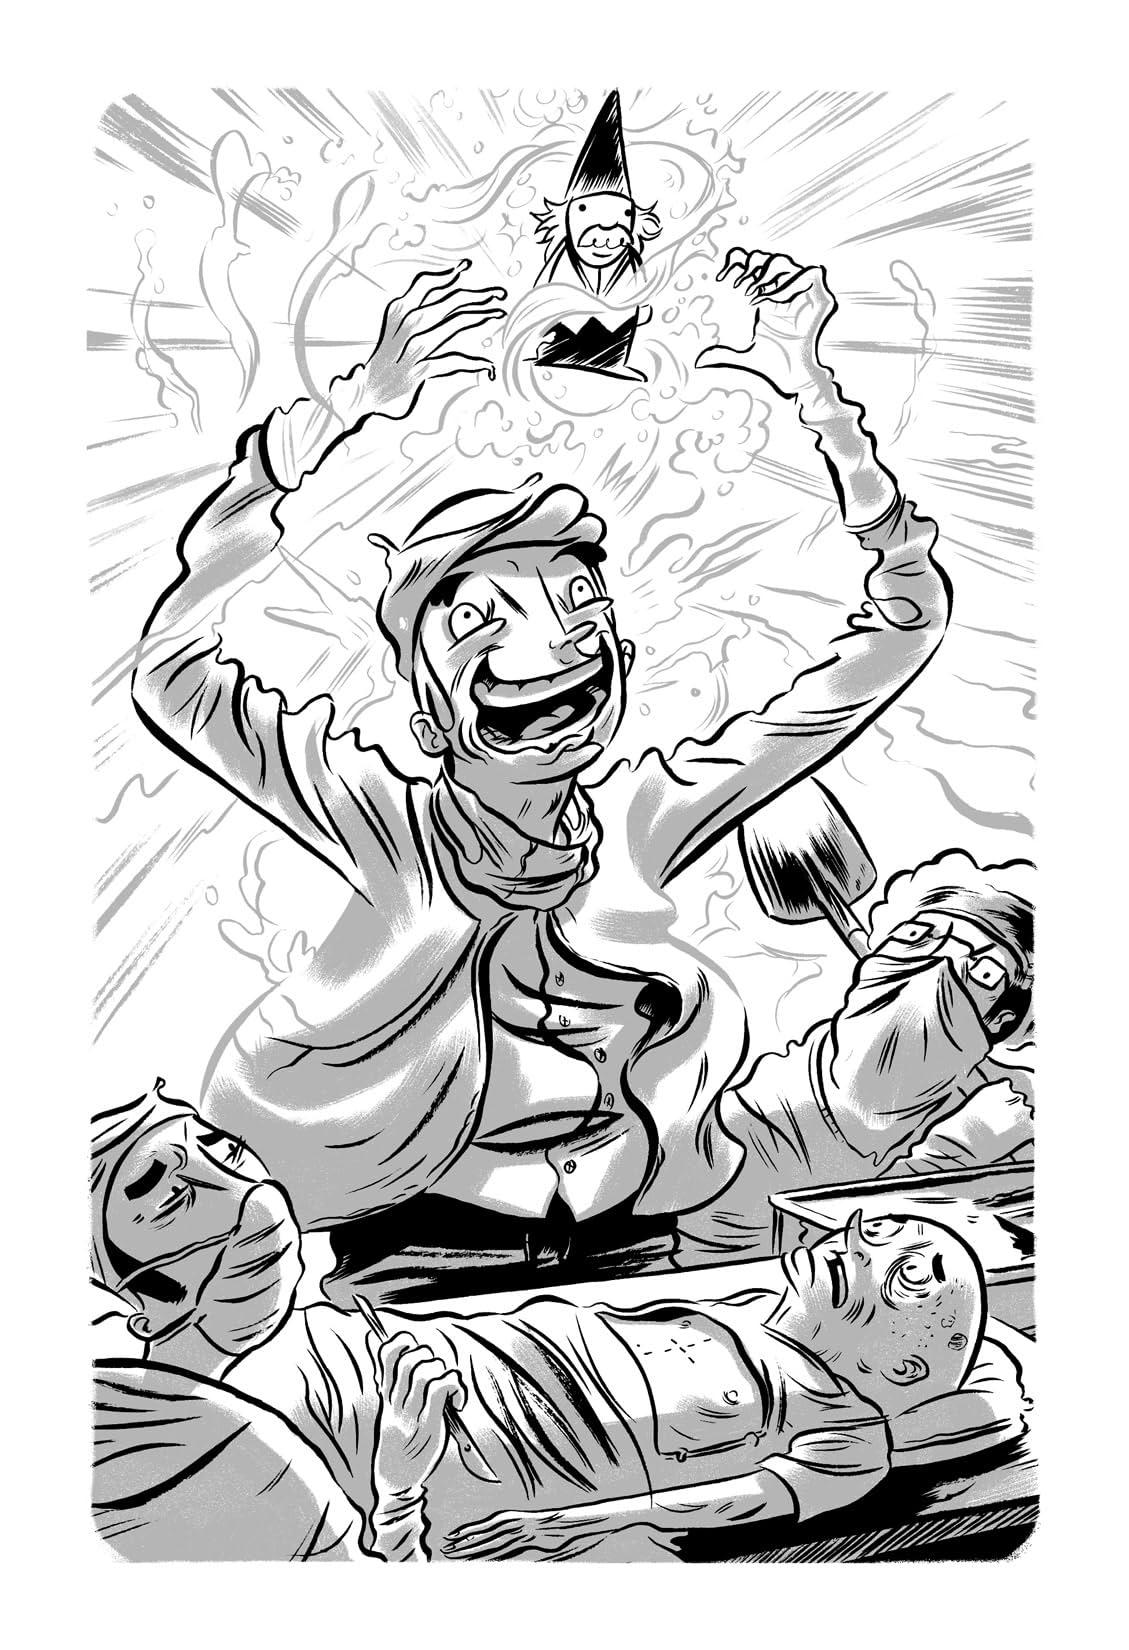 Cartoon Guidebook to Absolute Failure #2